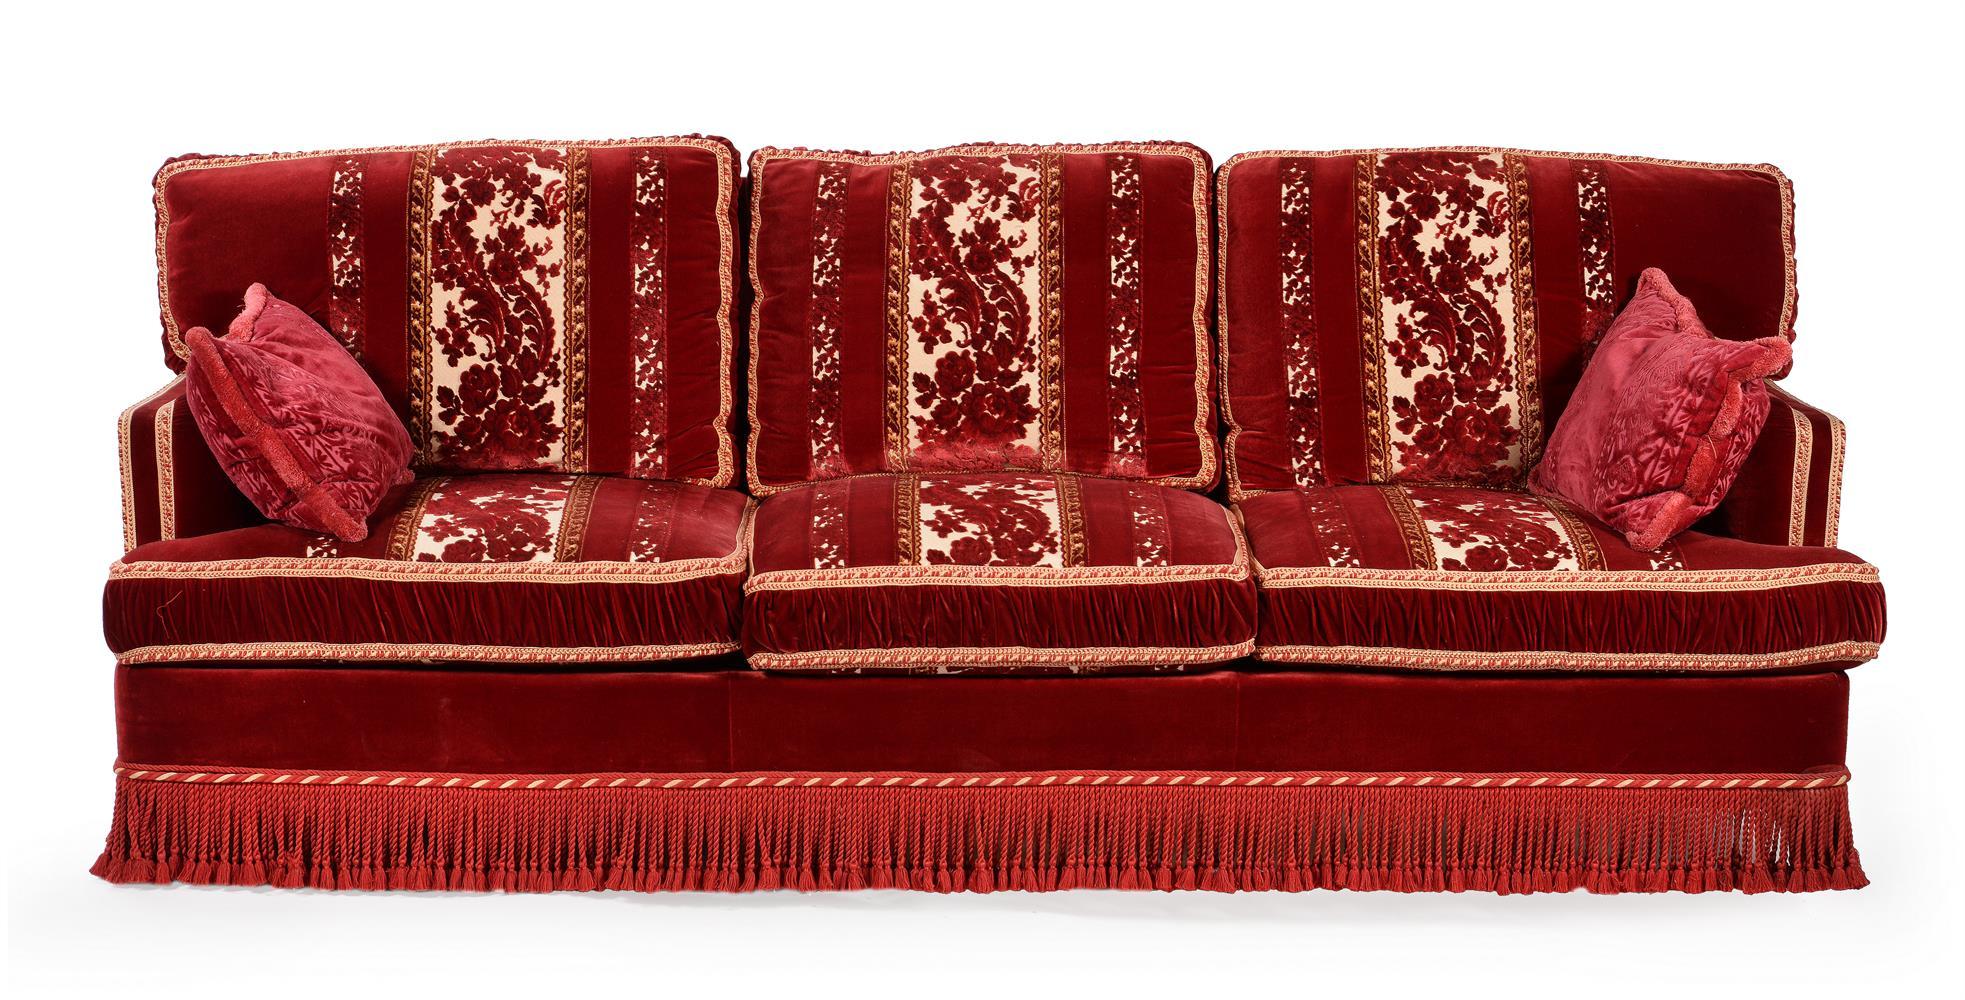 A three seat sofa - Image 2 of 2